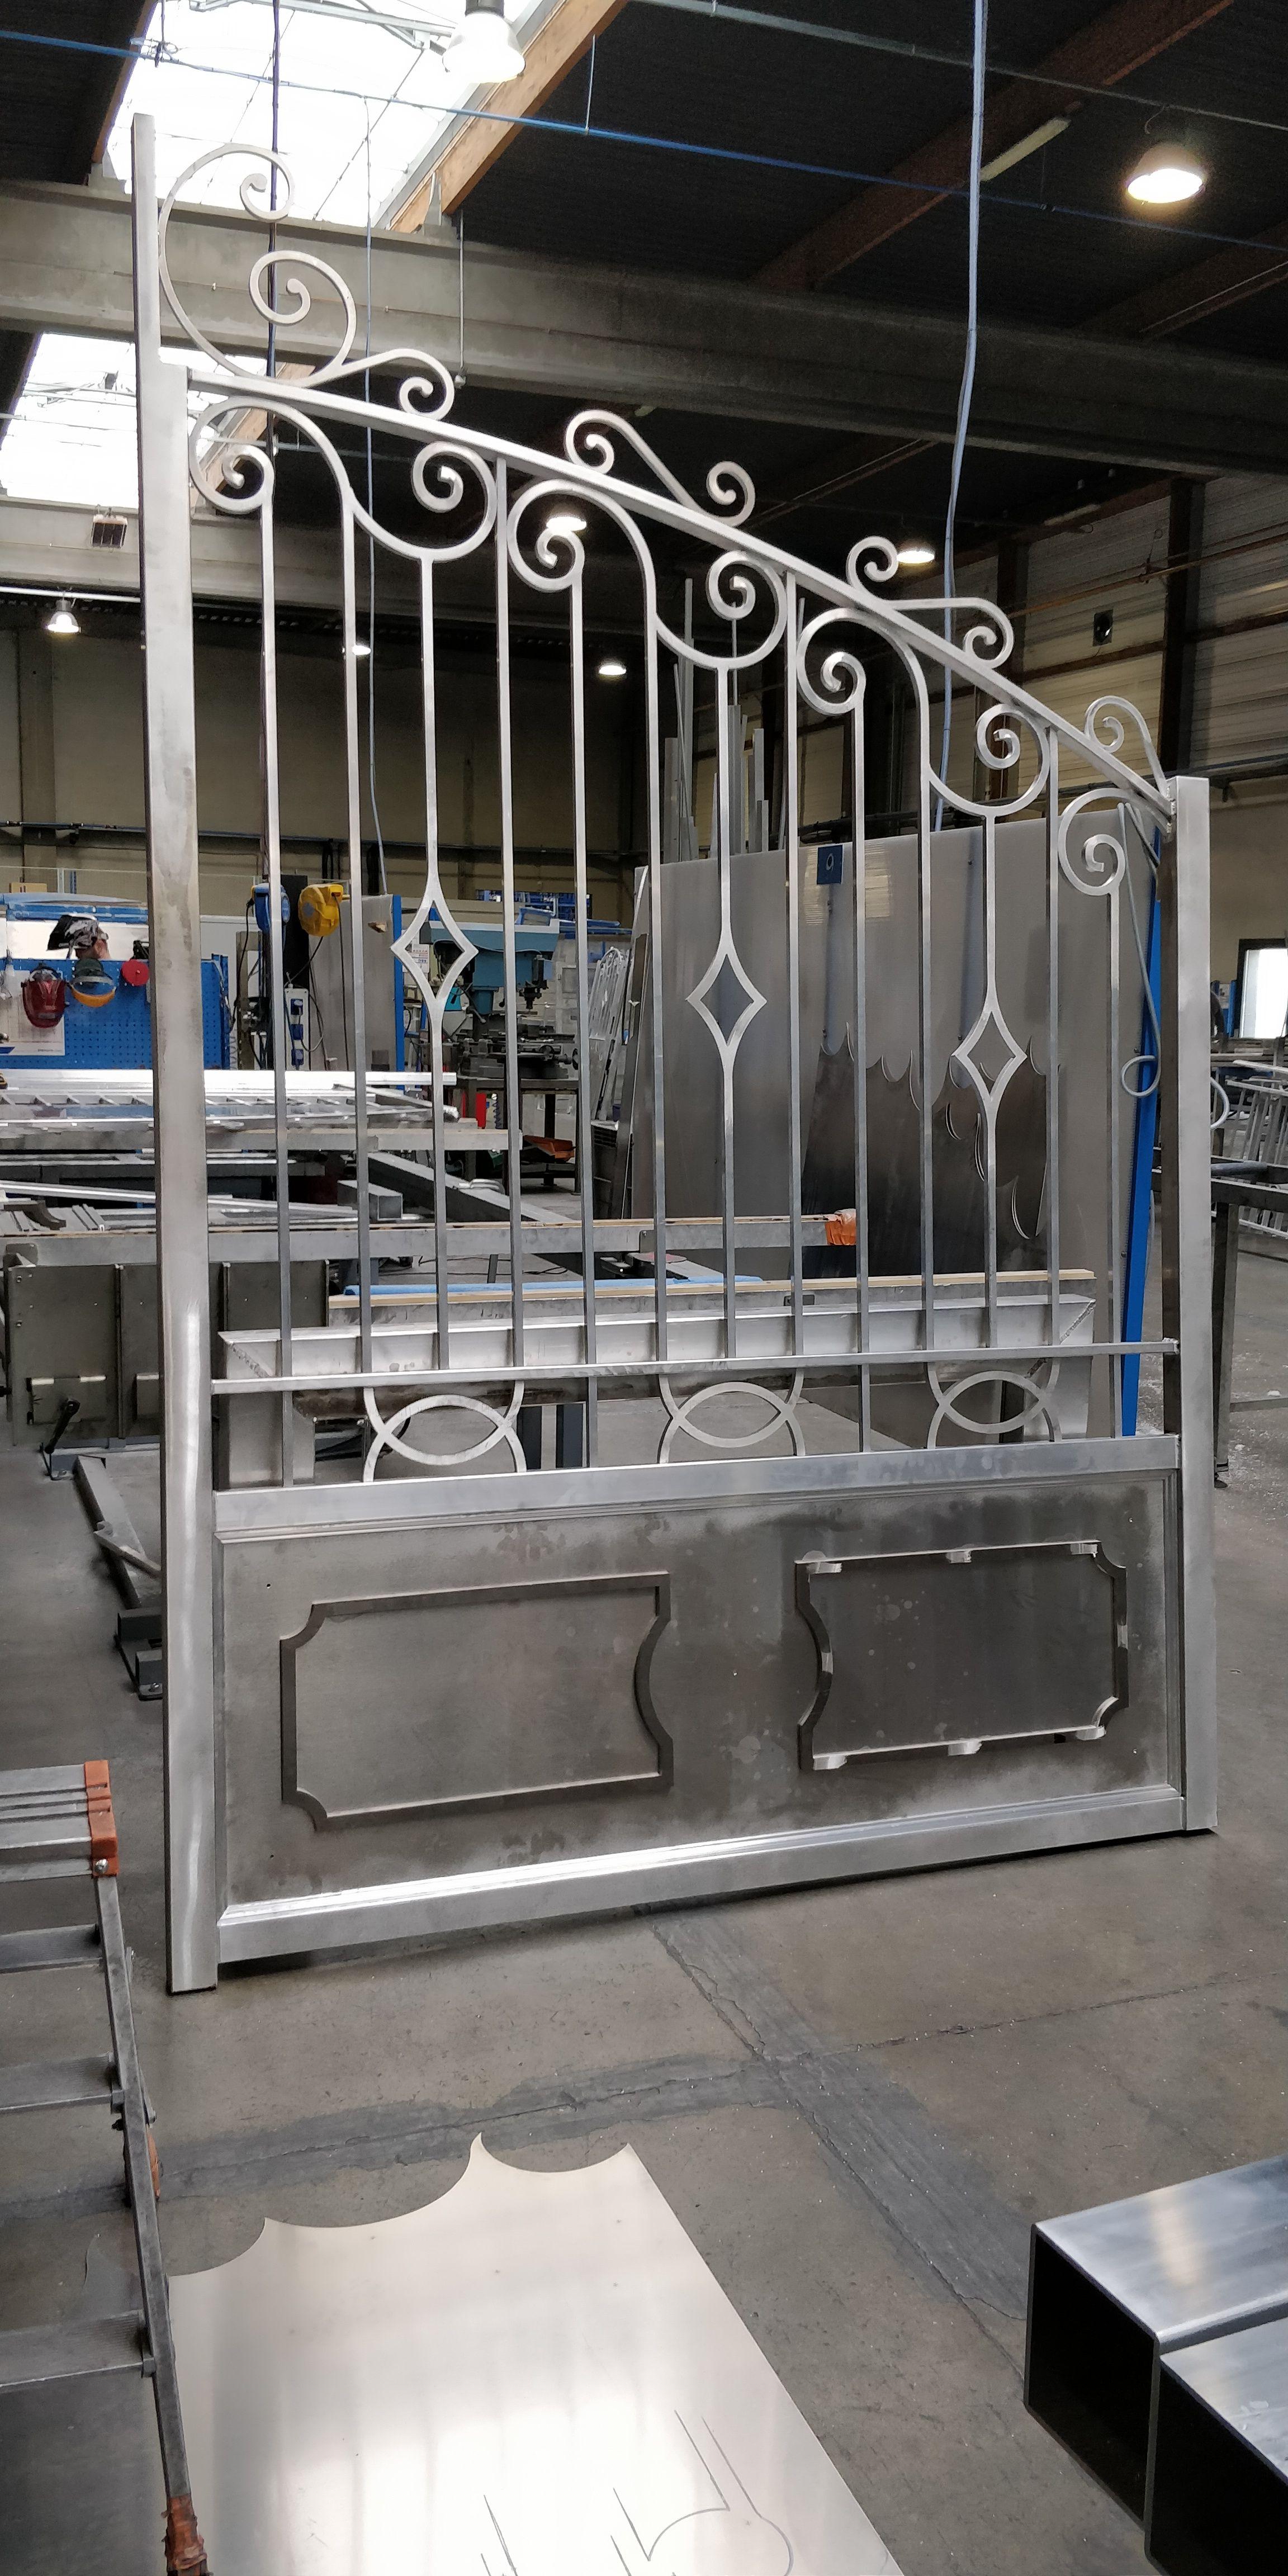 Portail Ouvrage Sur Mesure En Aluminium Soude Portail Portillon Gate Gardecorps Claustra Marquise Aluminium Surmes En 2020 Claustra Portail Portail Portillon